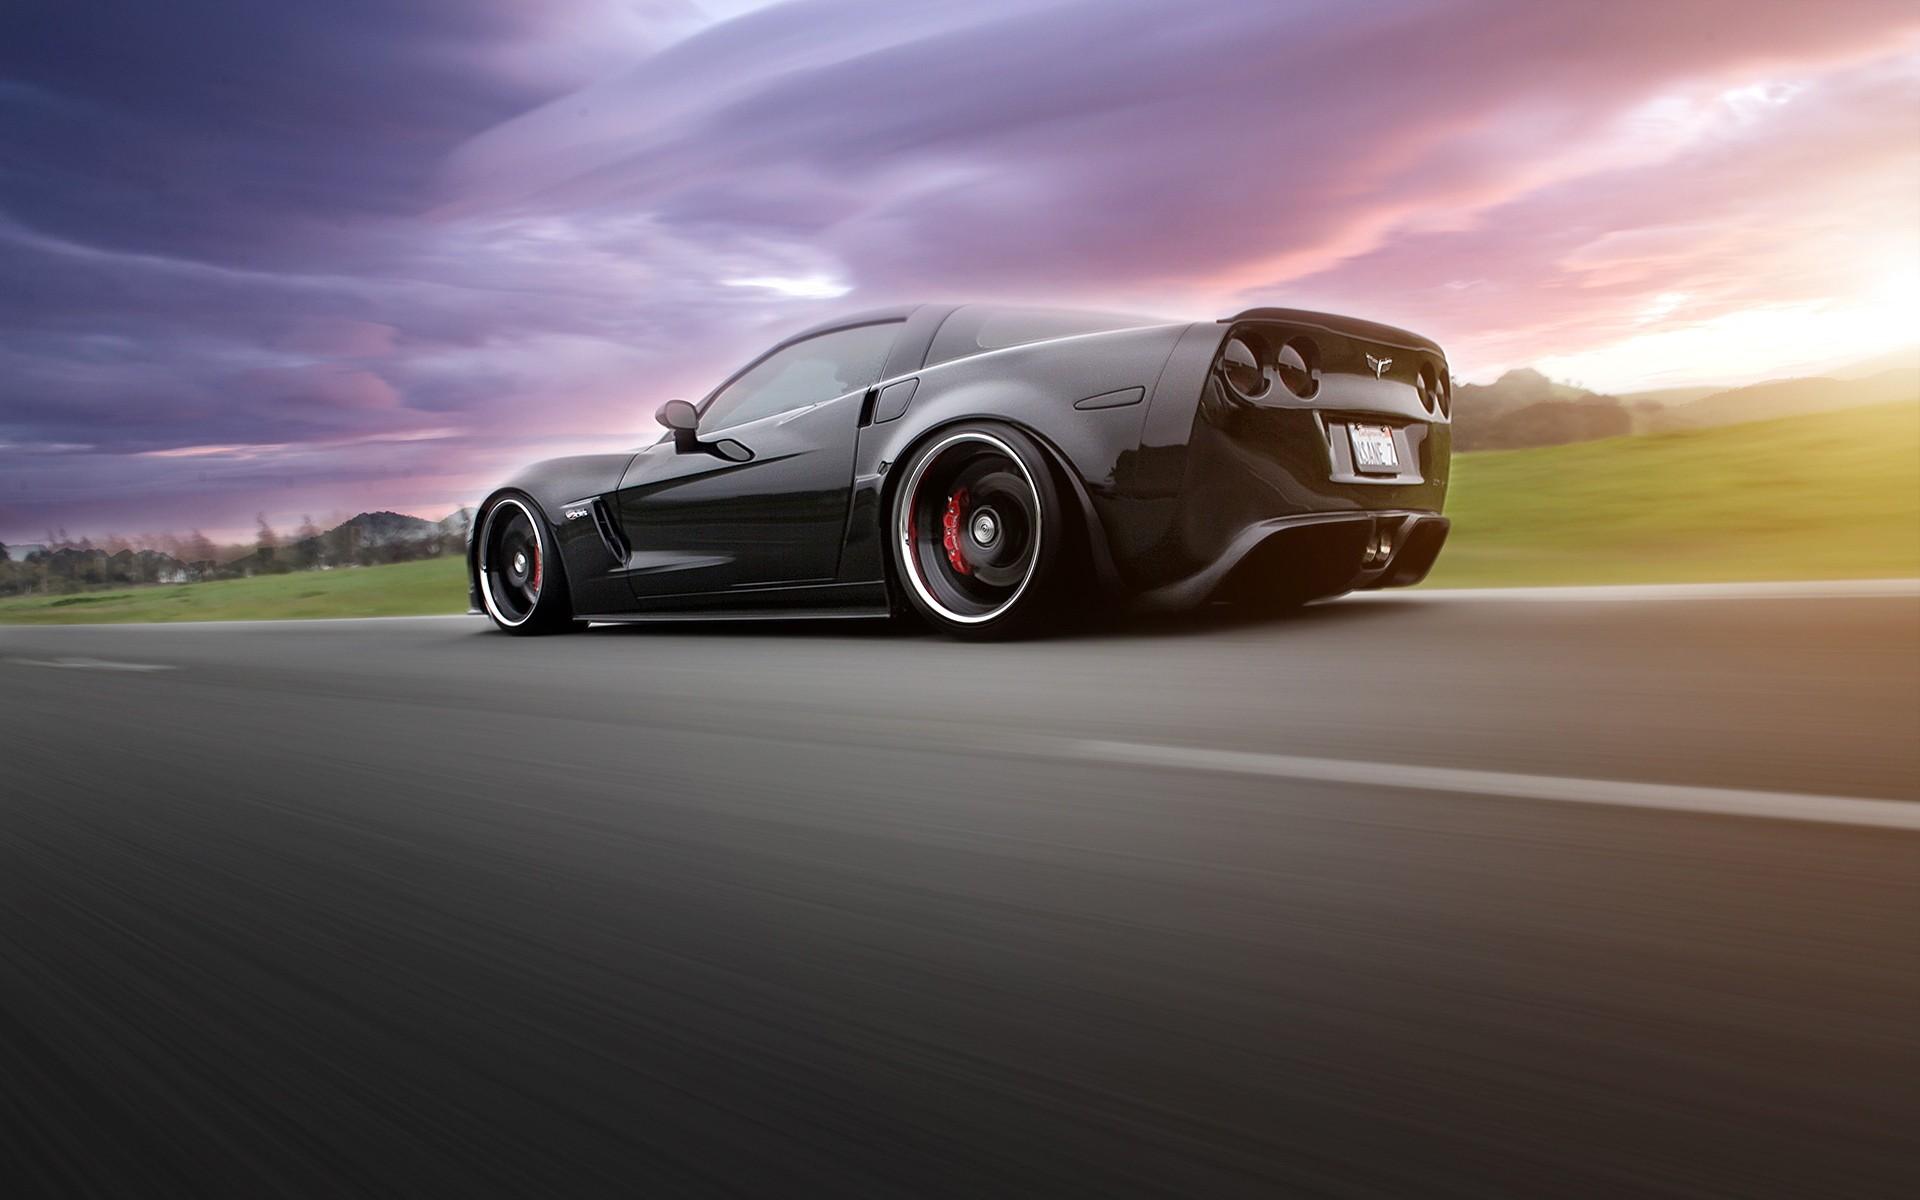 HD Corvette Wallpapers 1920x1200